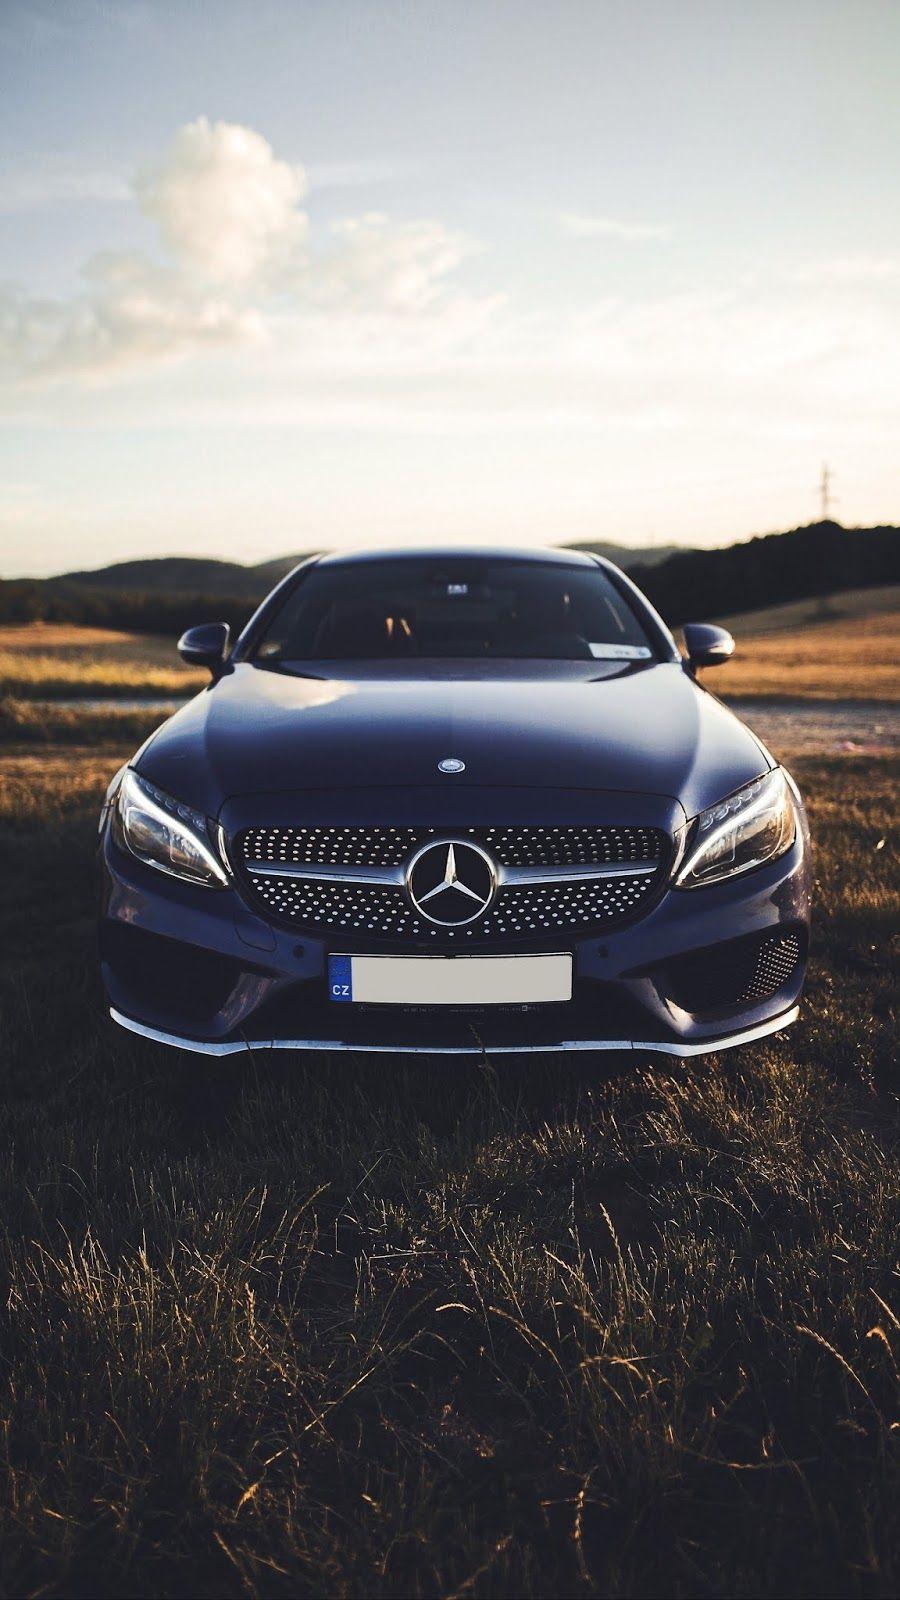 Mercedes Benz Cls Class Mercedes Benz Mercedes Mercedes Benz Cls Mercedes Car Mercedes Benz Wallpaper